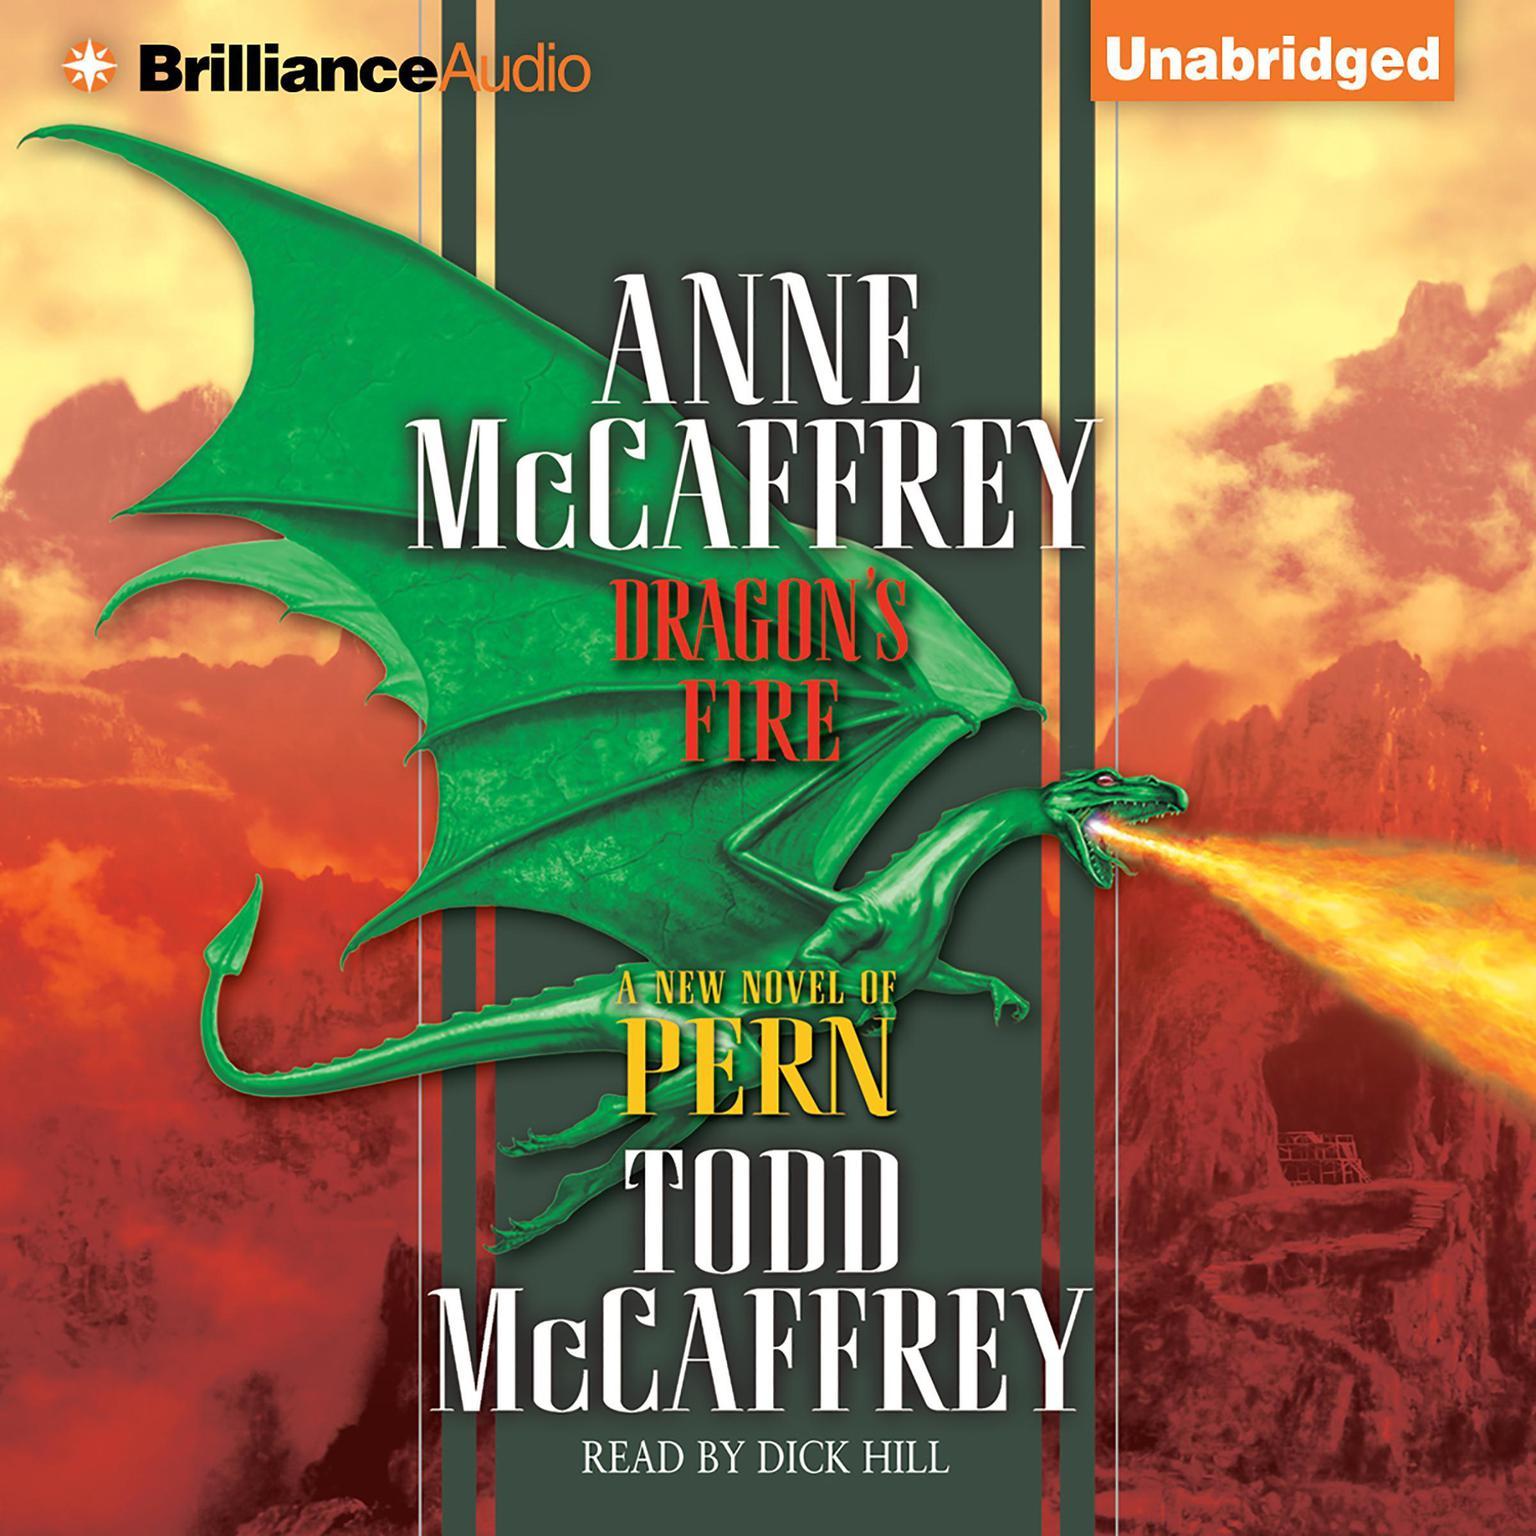 Printable Dragon's Fire Audiobook Cover Art